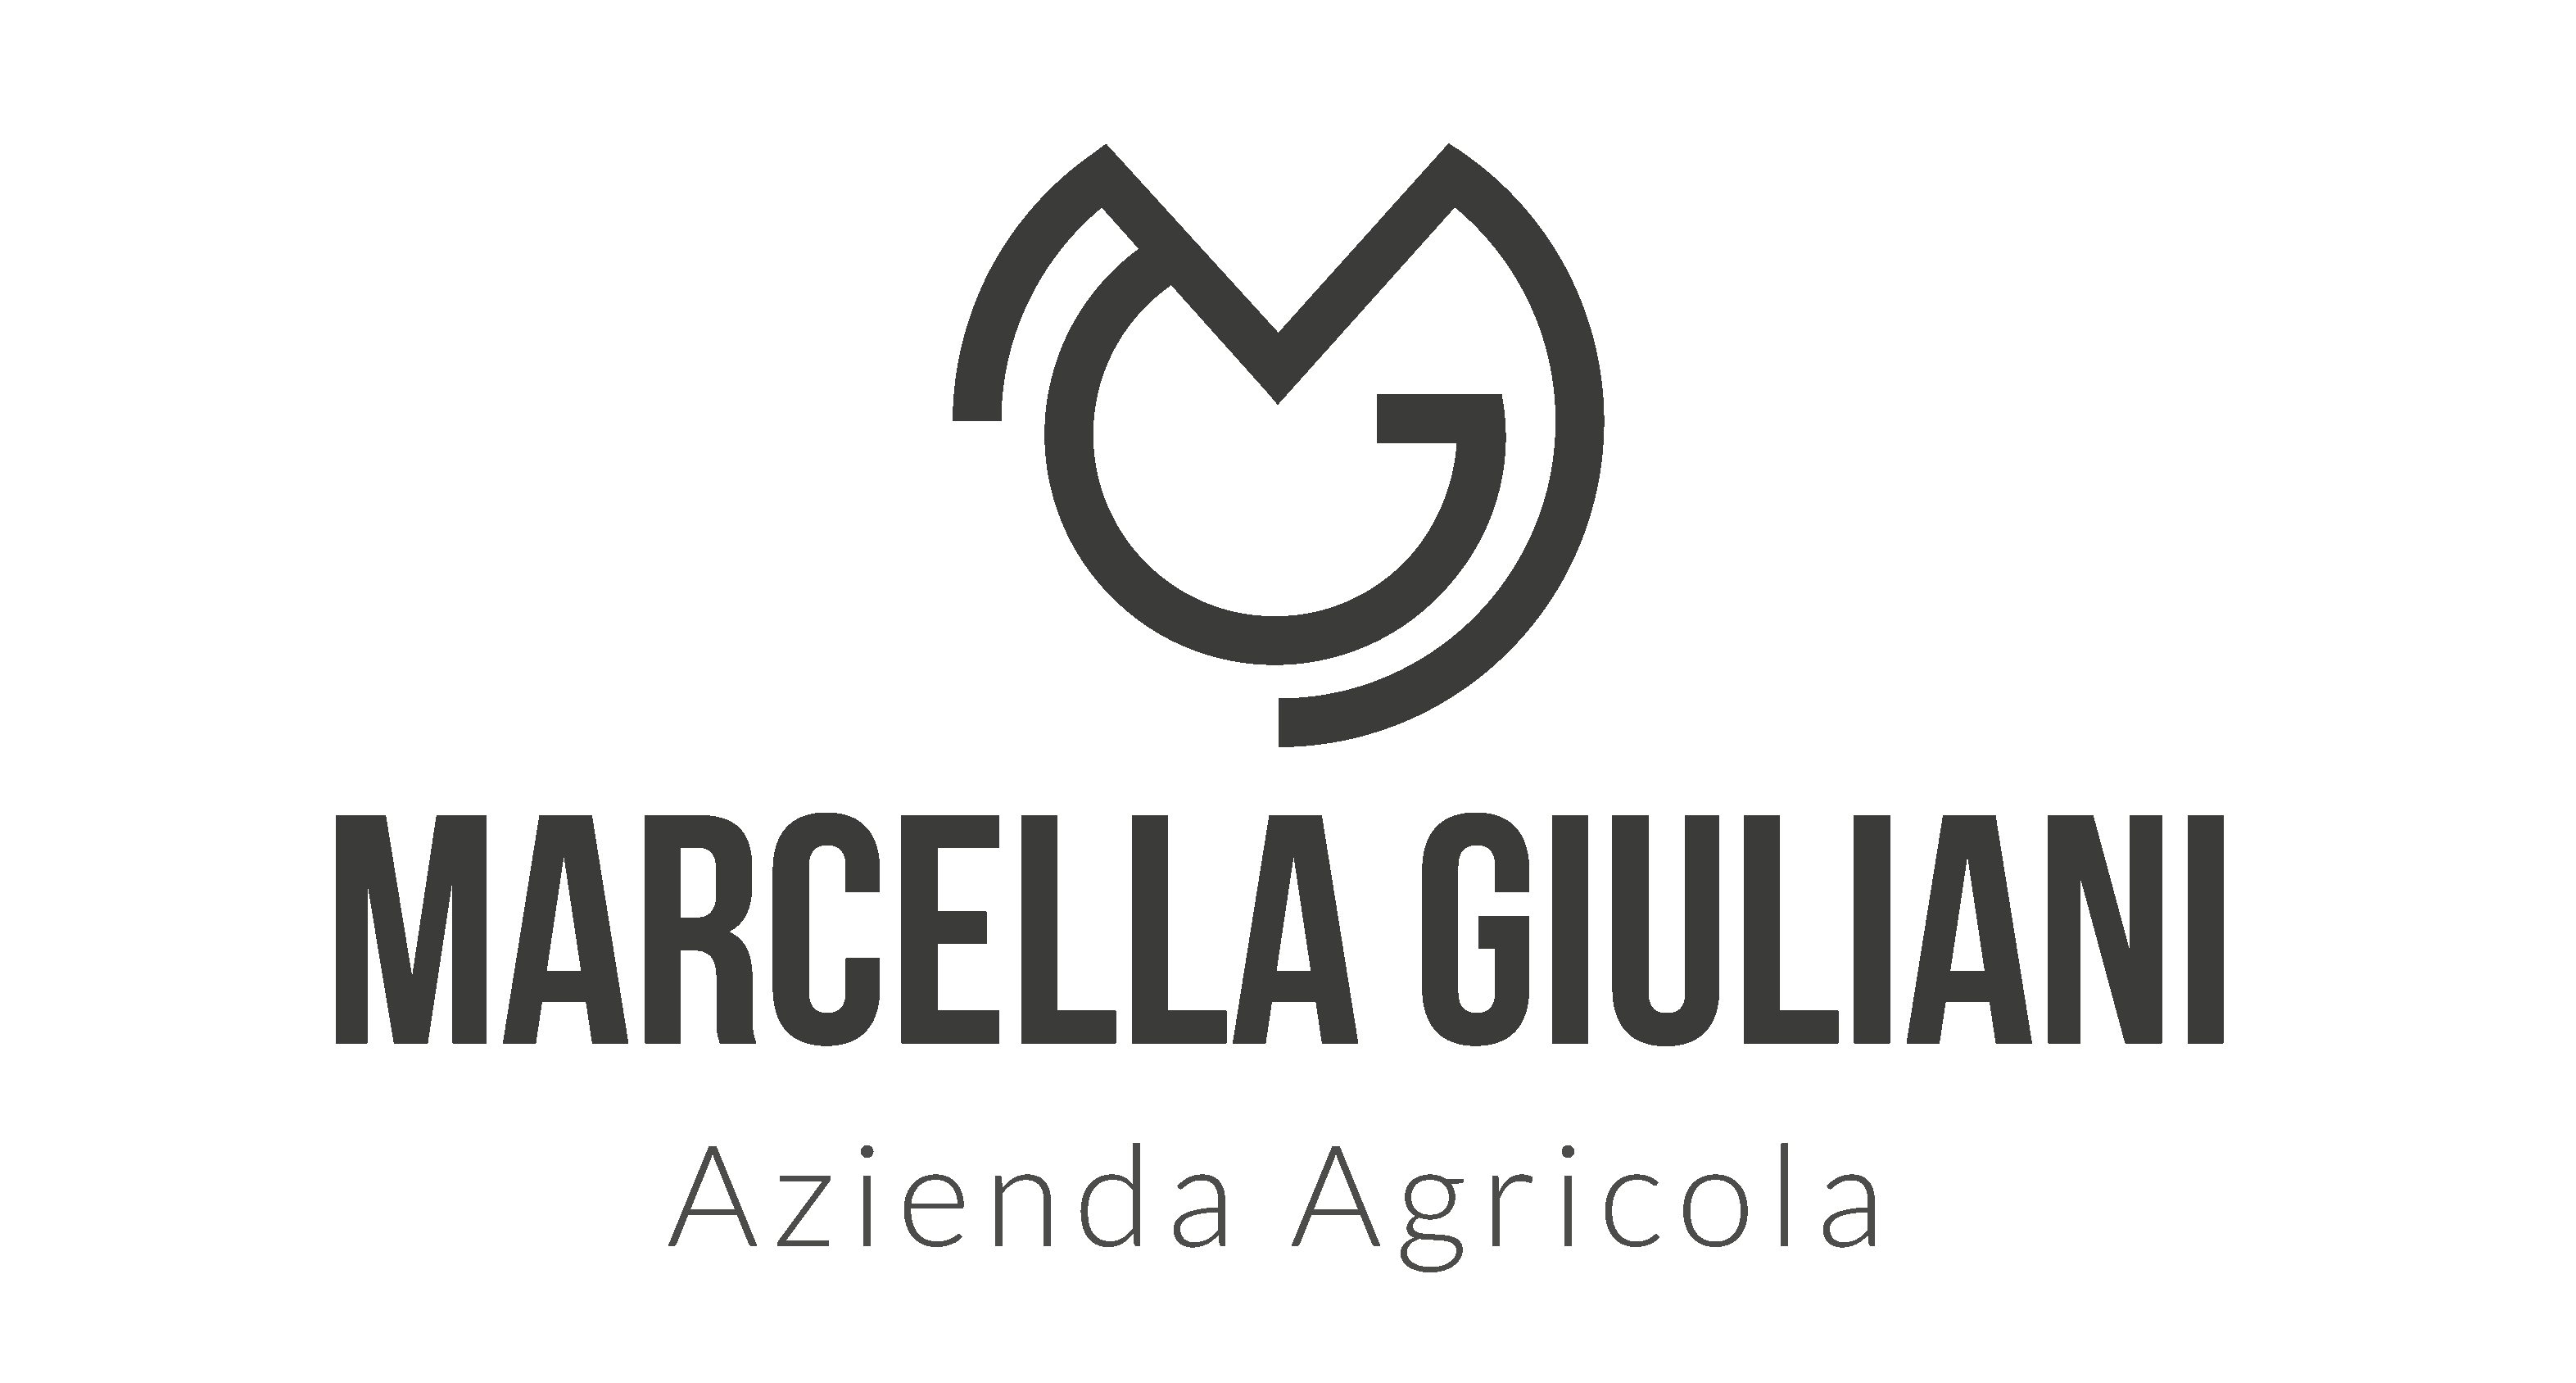 logo marcella giuliani agricola